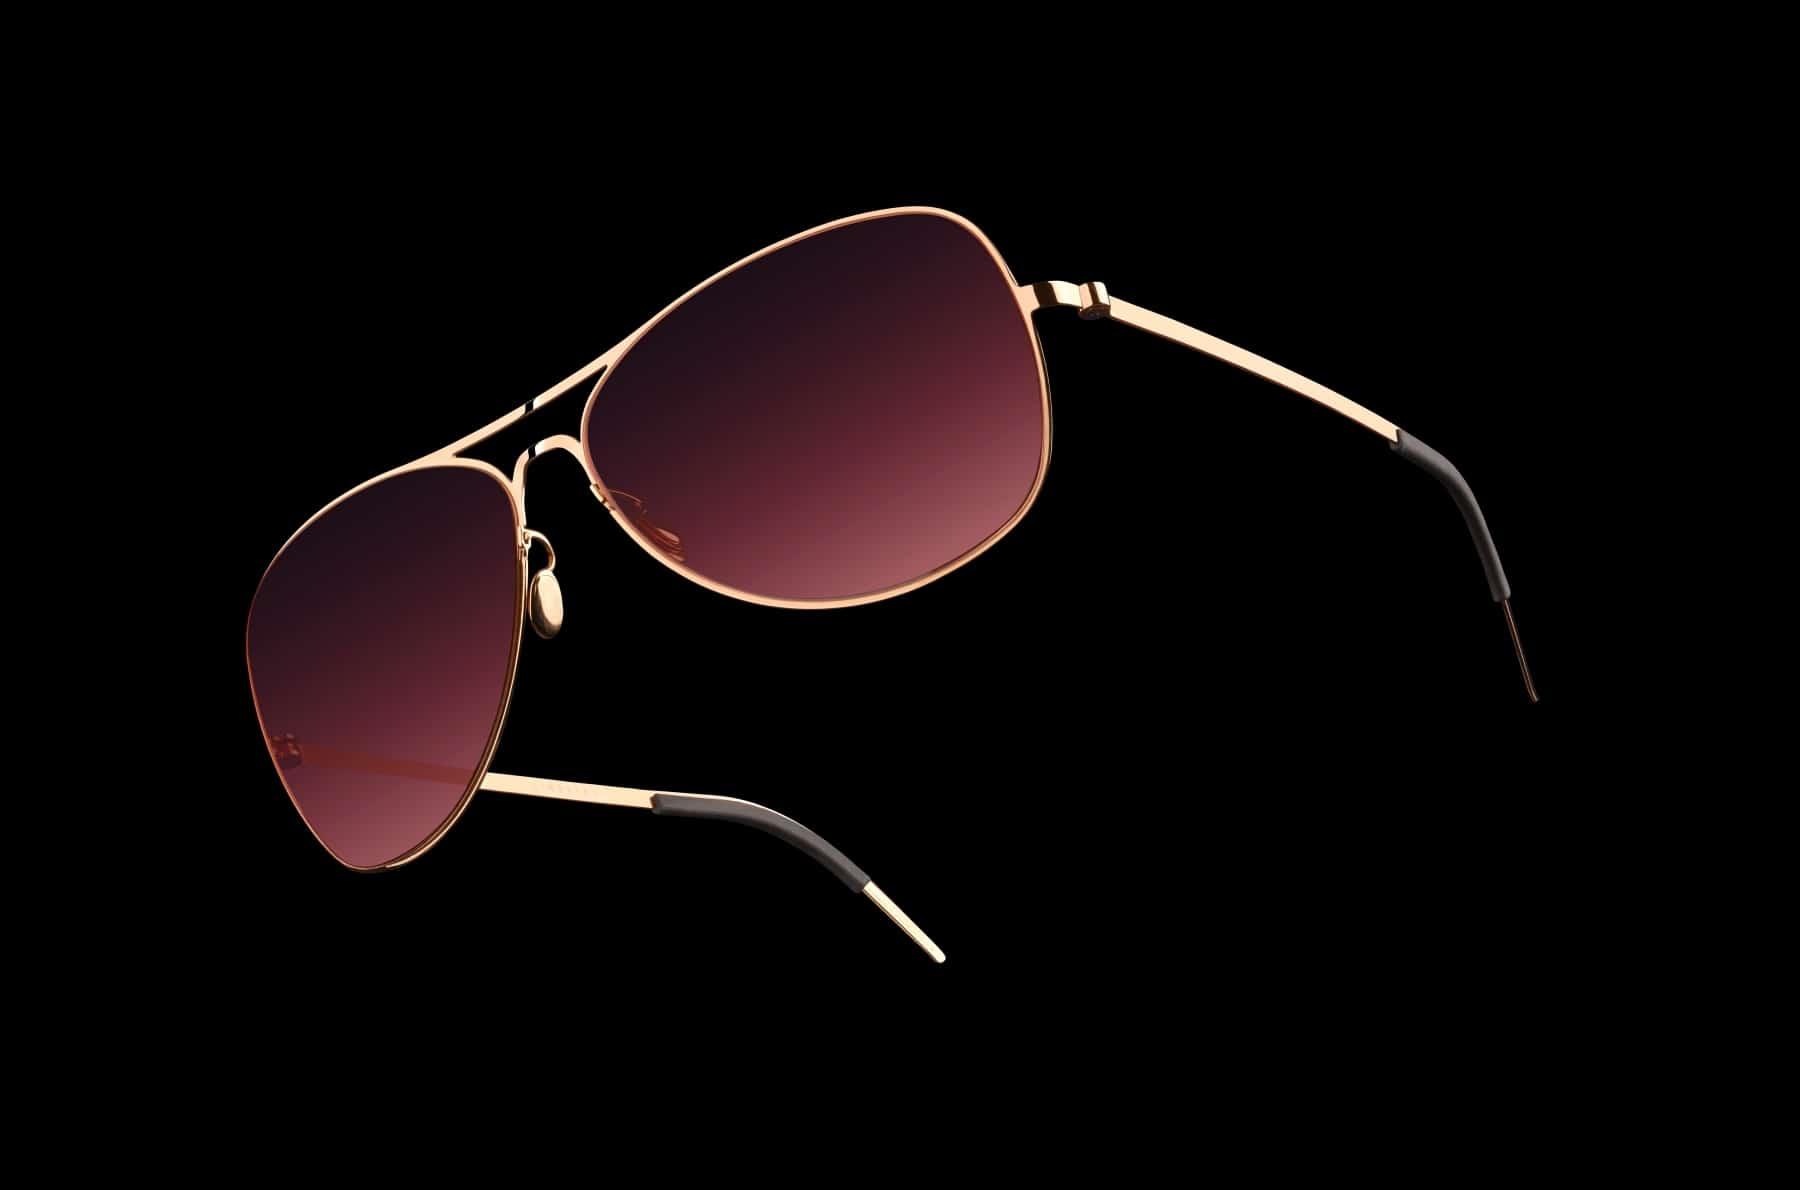 lindberg 5000 solid gold sunglasses nose pad